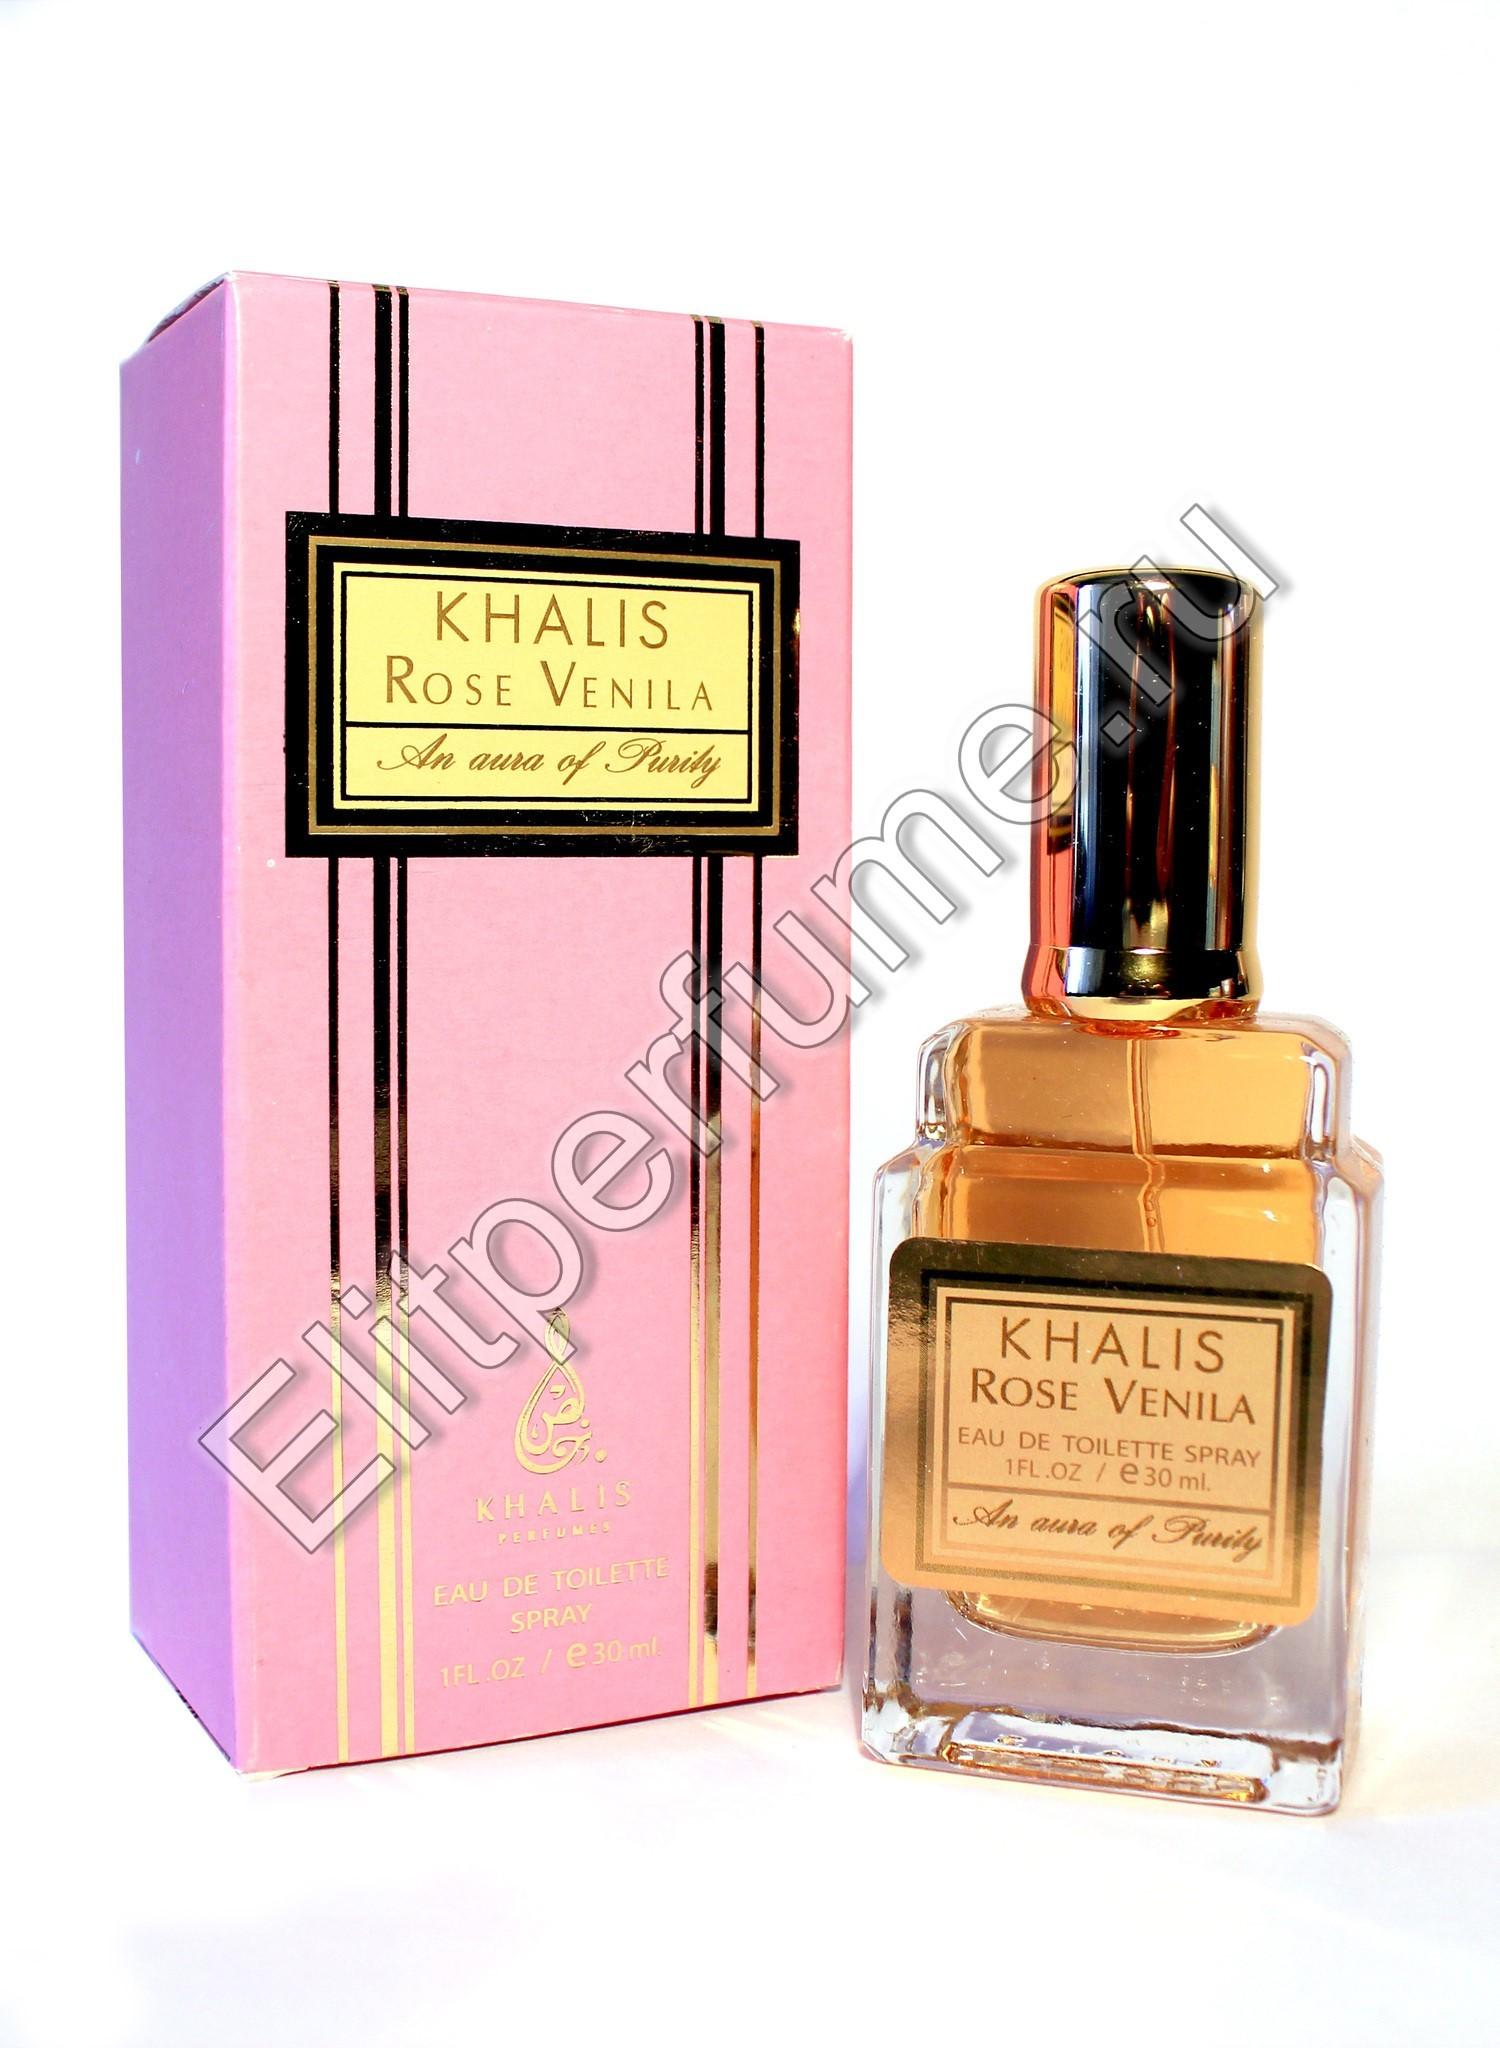 Rose Vanilla Роза Ваниль 30 мл парфюмированная вода  от Халис Khalis Perfumes